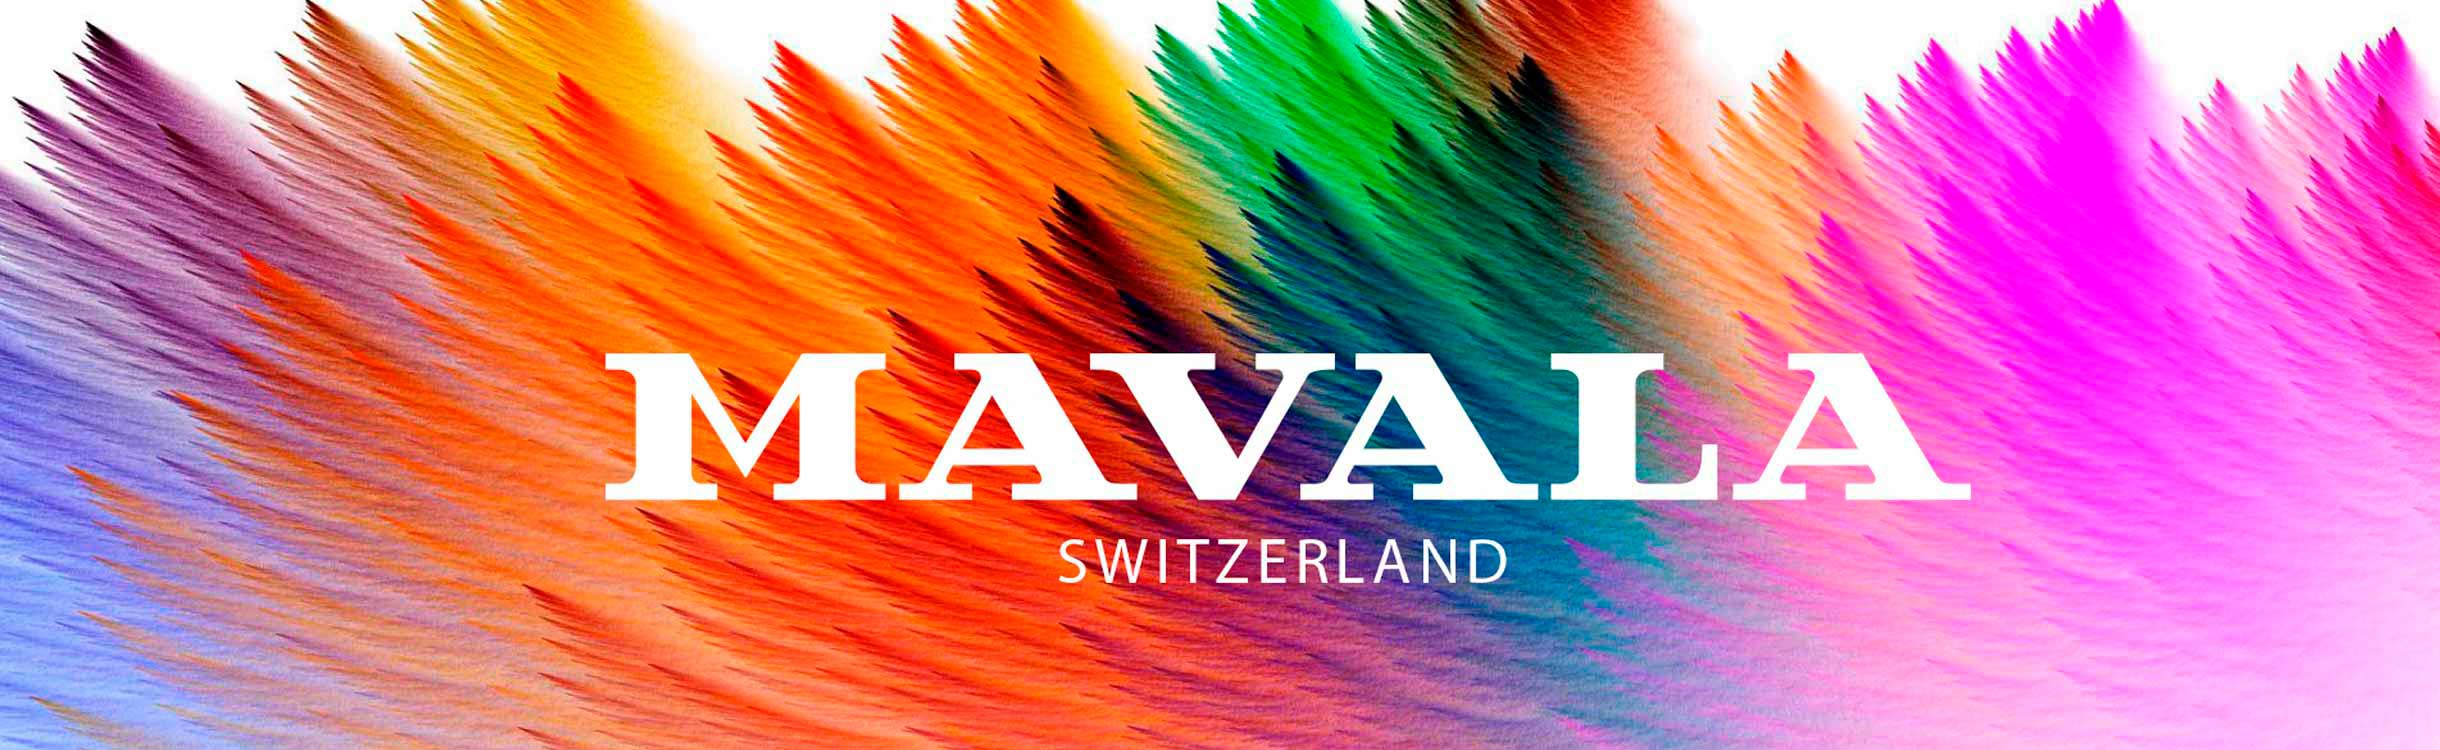 Spray Secante e Finalizadores Mavala